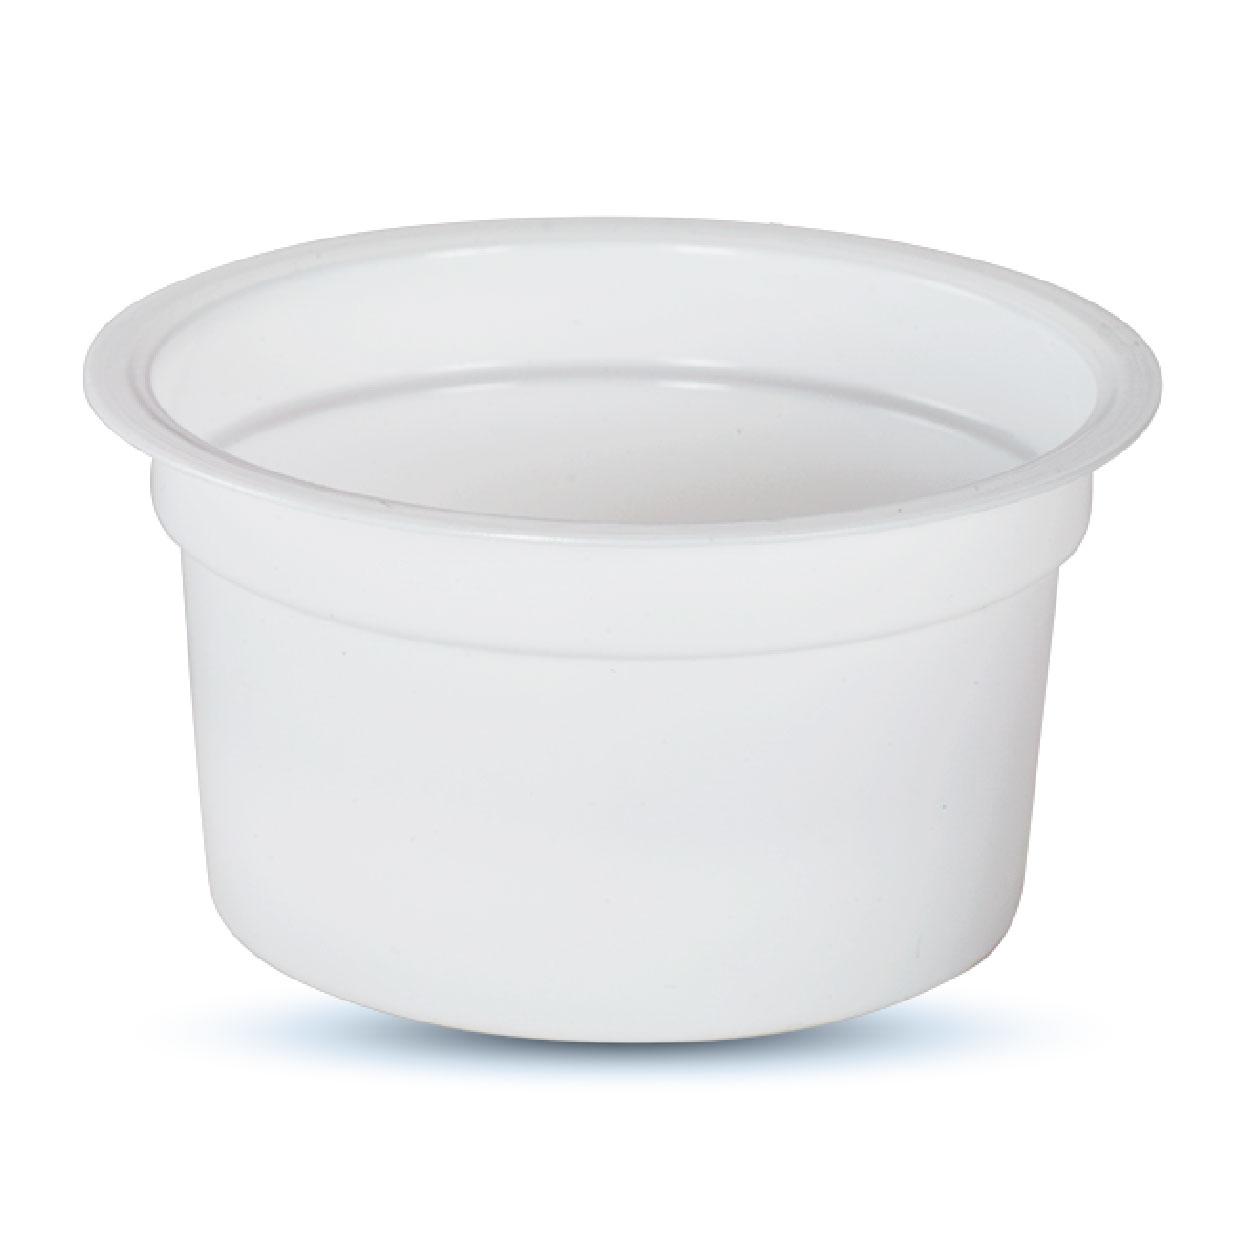 Polar Ice Cream Cup 100 ML Printed-White